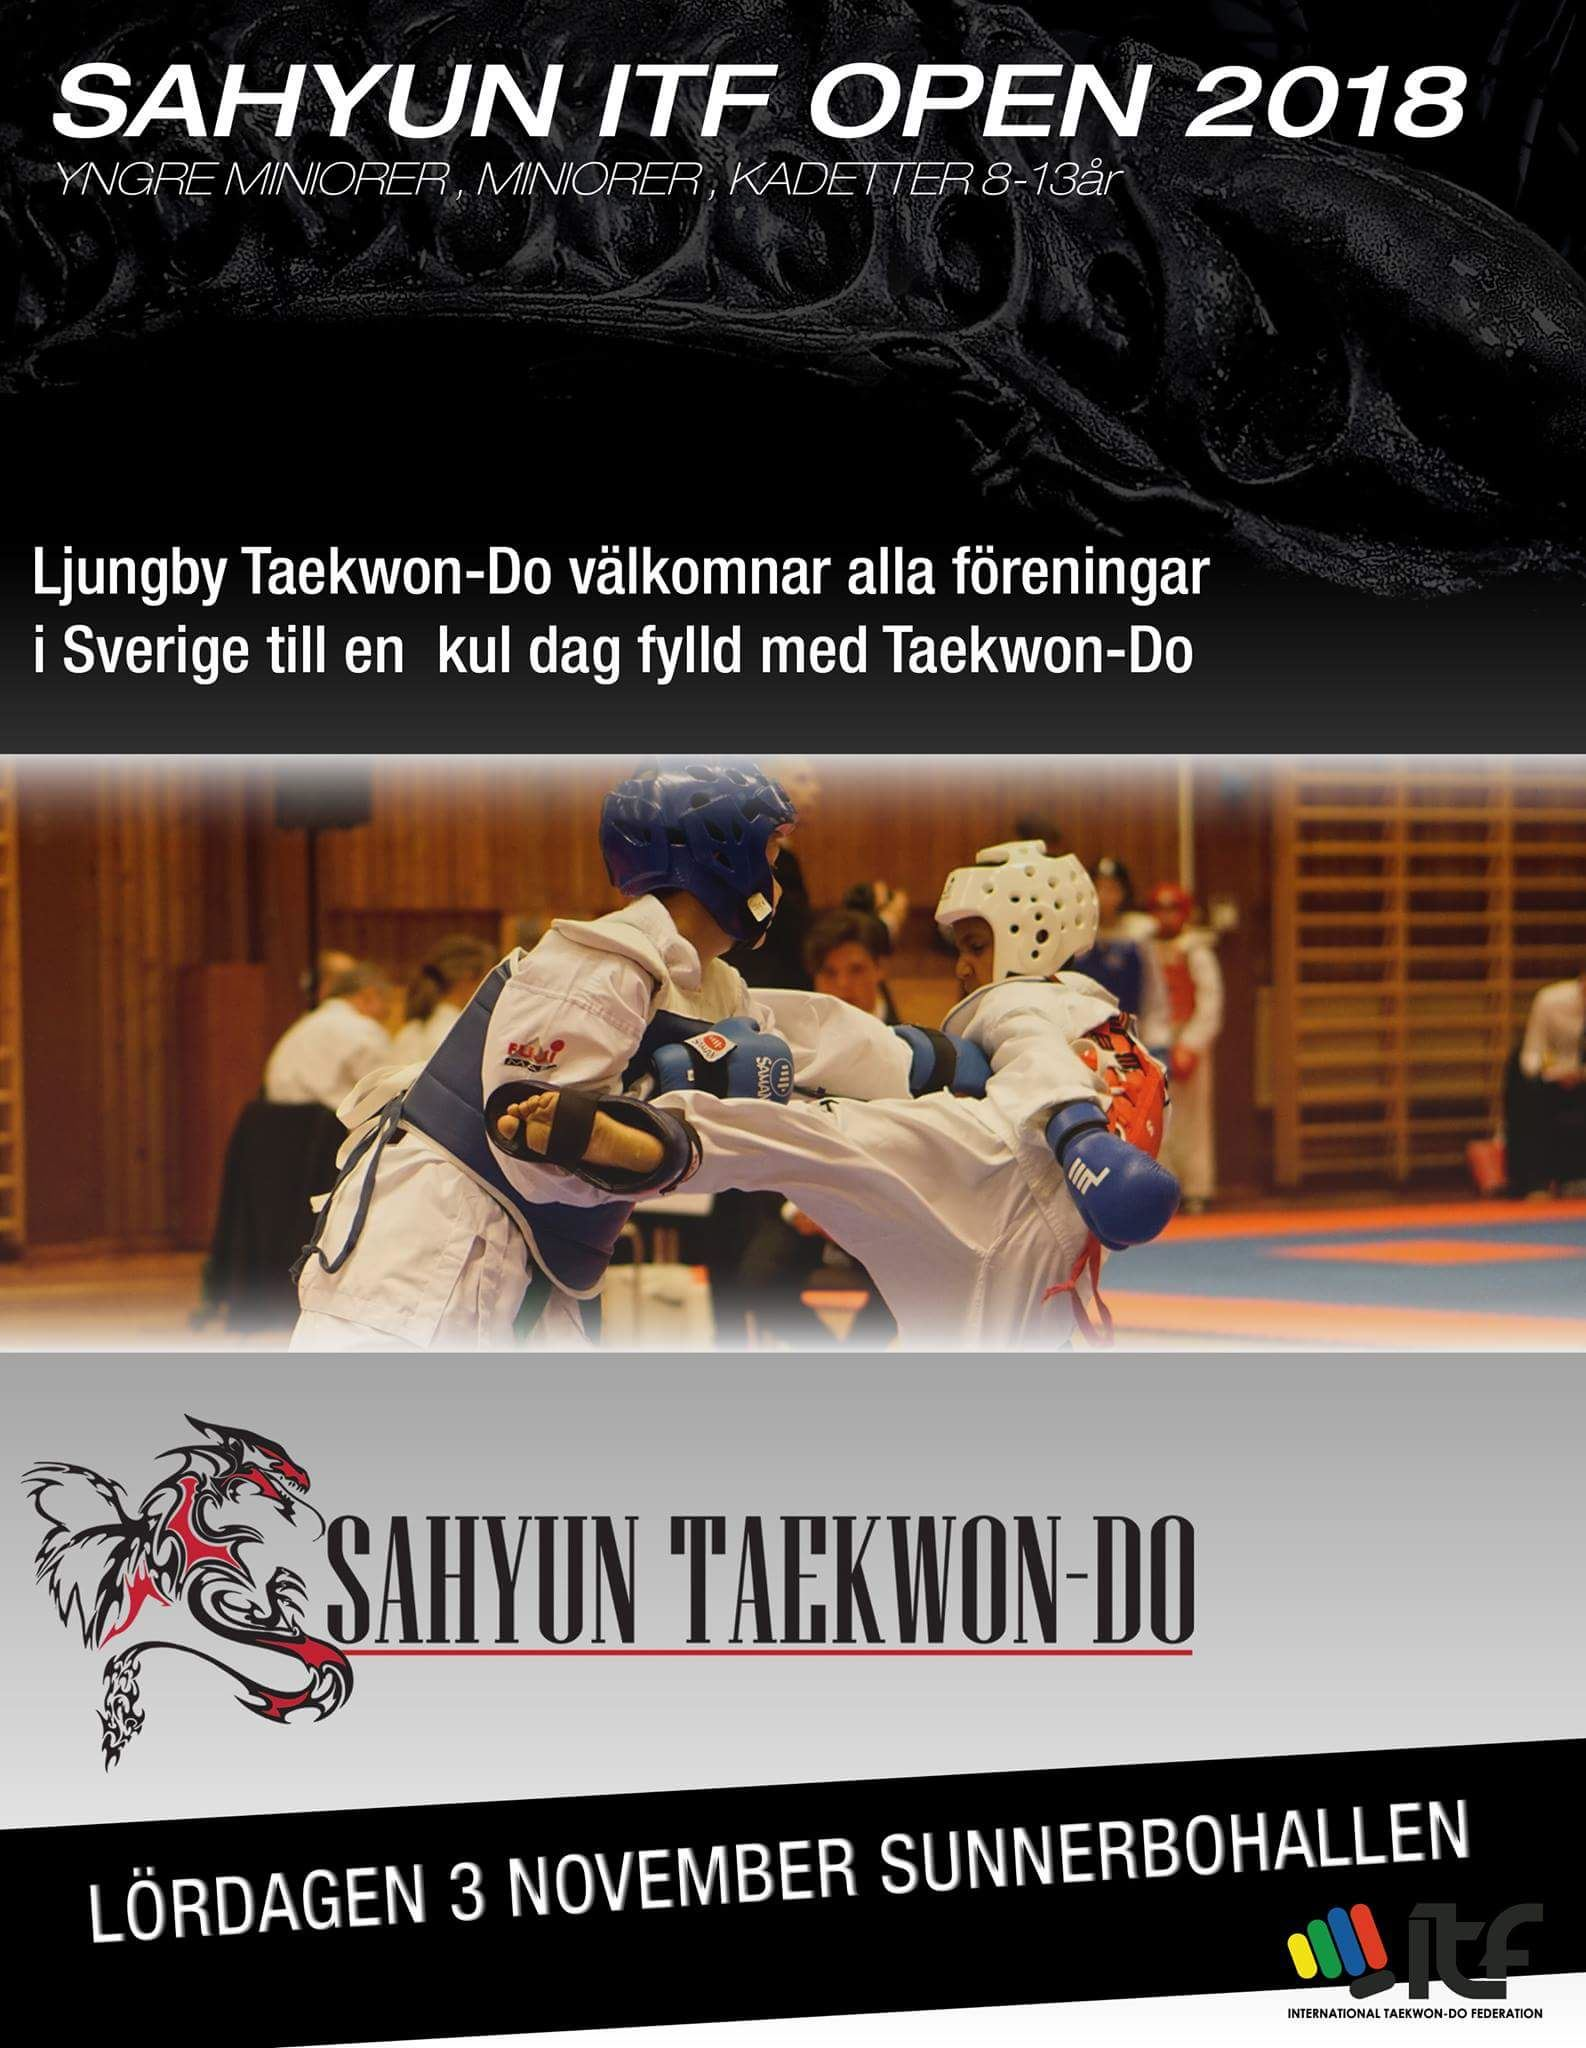 Ljungby Taekwon-Do